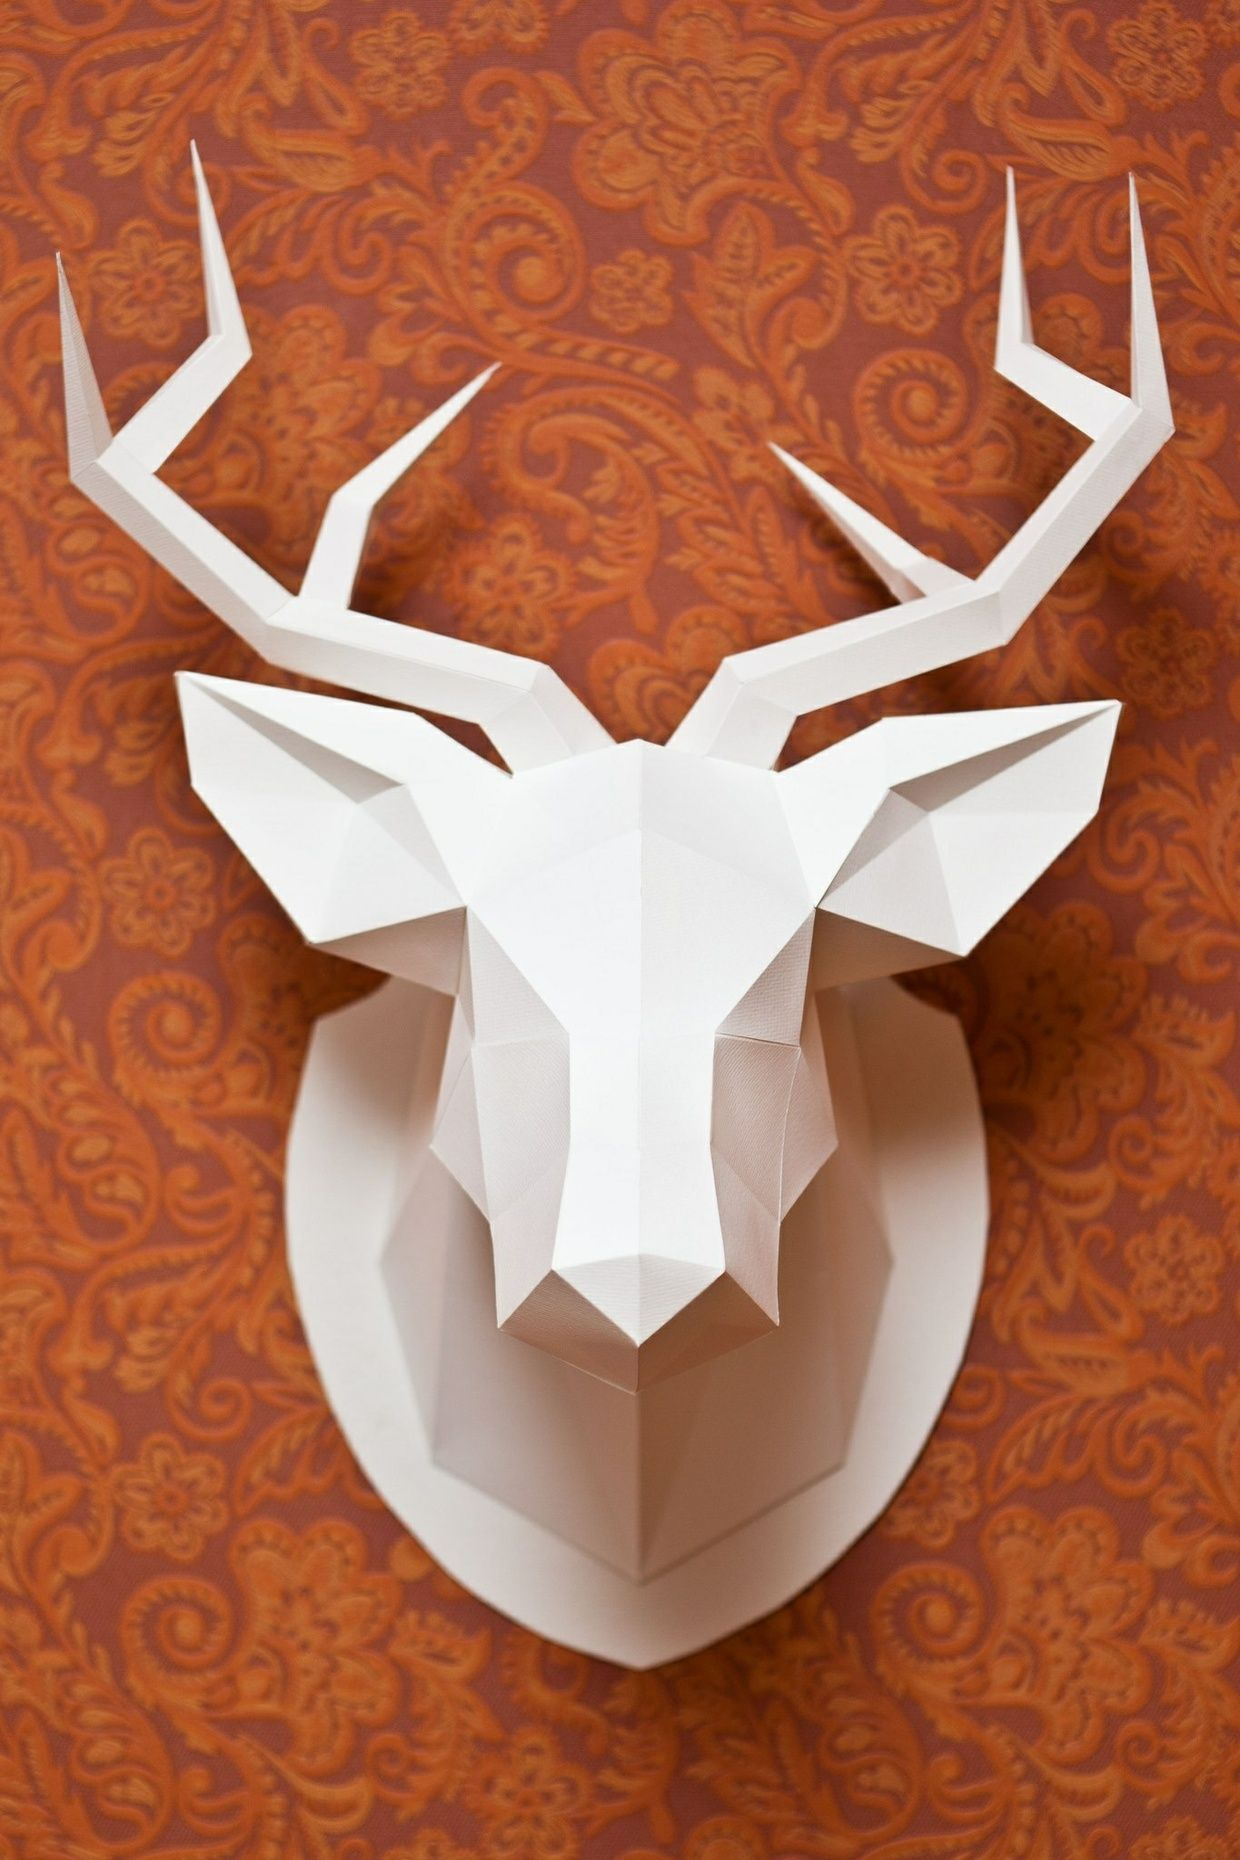 La plantilla 2d de la cabeza de ciervo la instrucci n en espa ol cabezas de carton pinterest - Cabeza ciervo carton ...